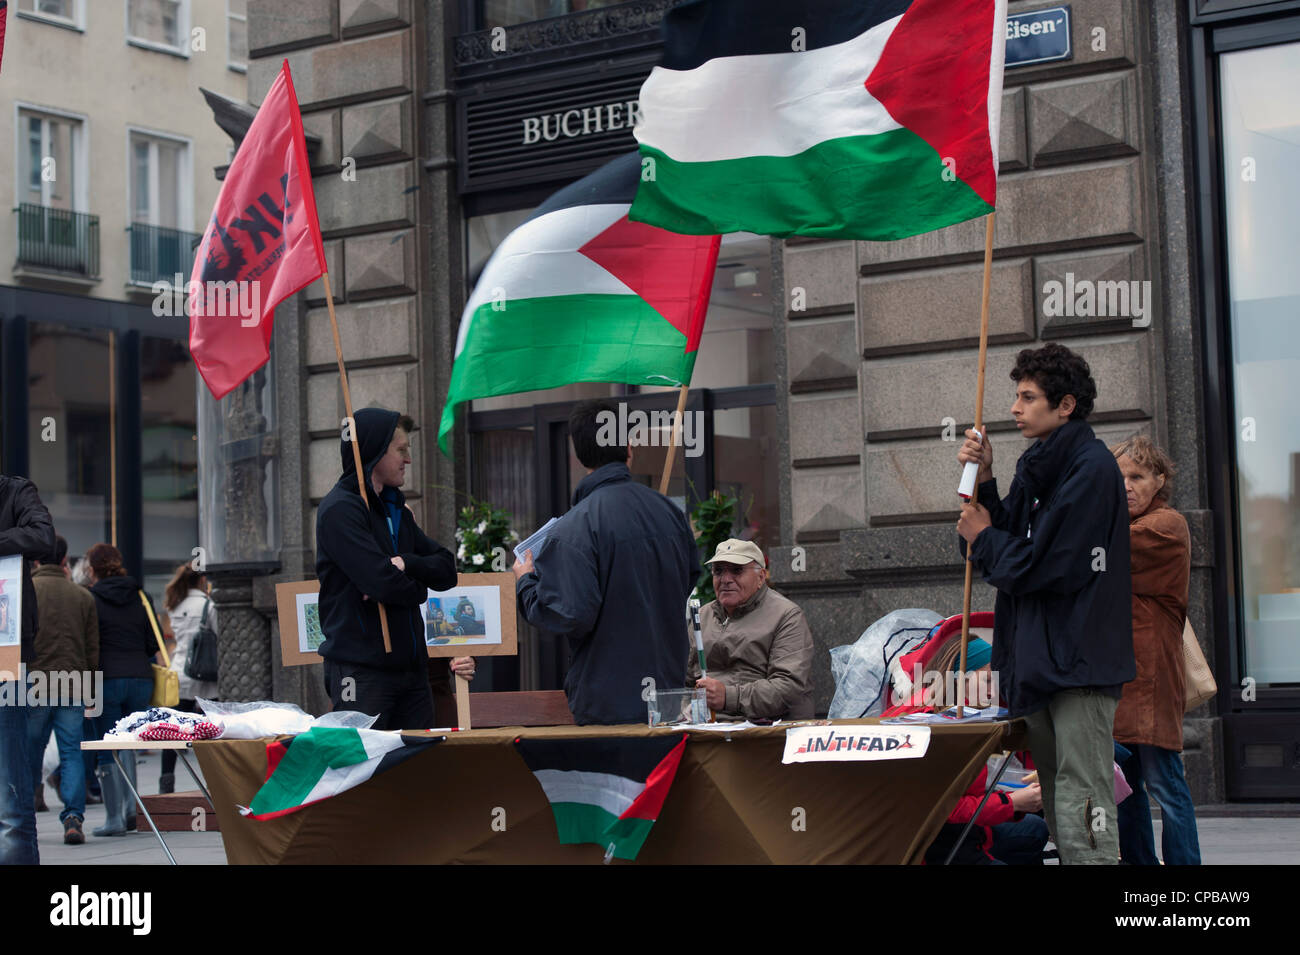 Demo in solidarity with Palestinian prisoners in Israeli jails - Stock Image